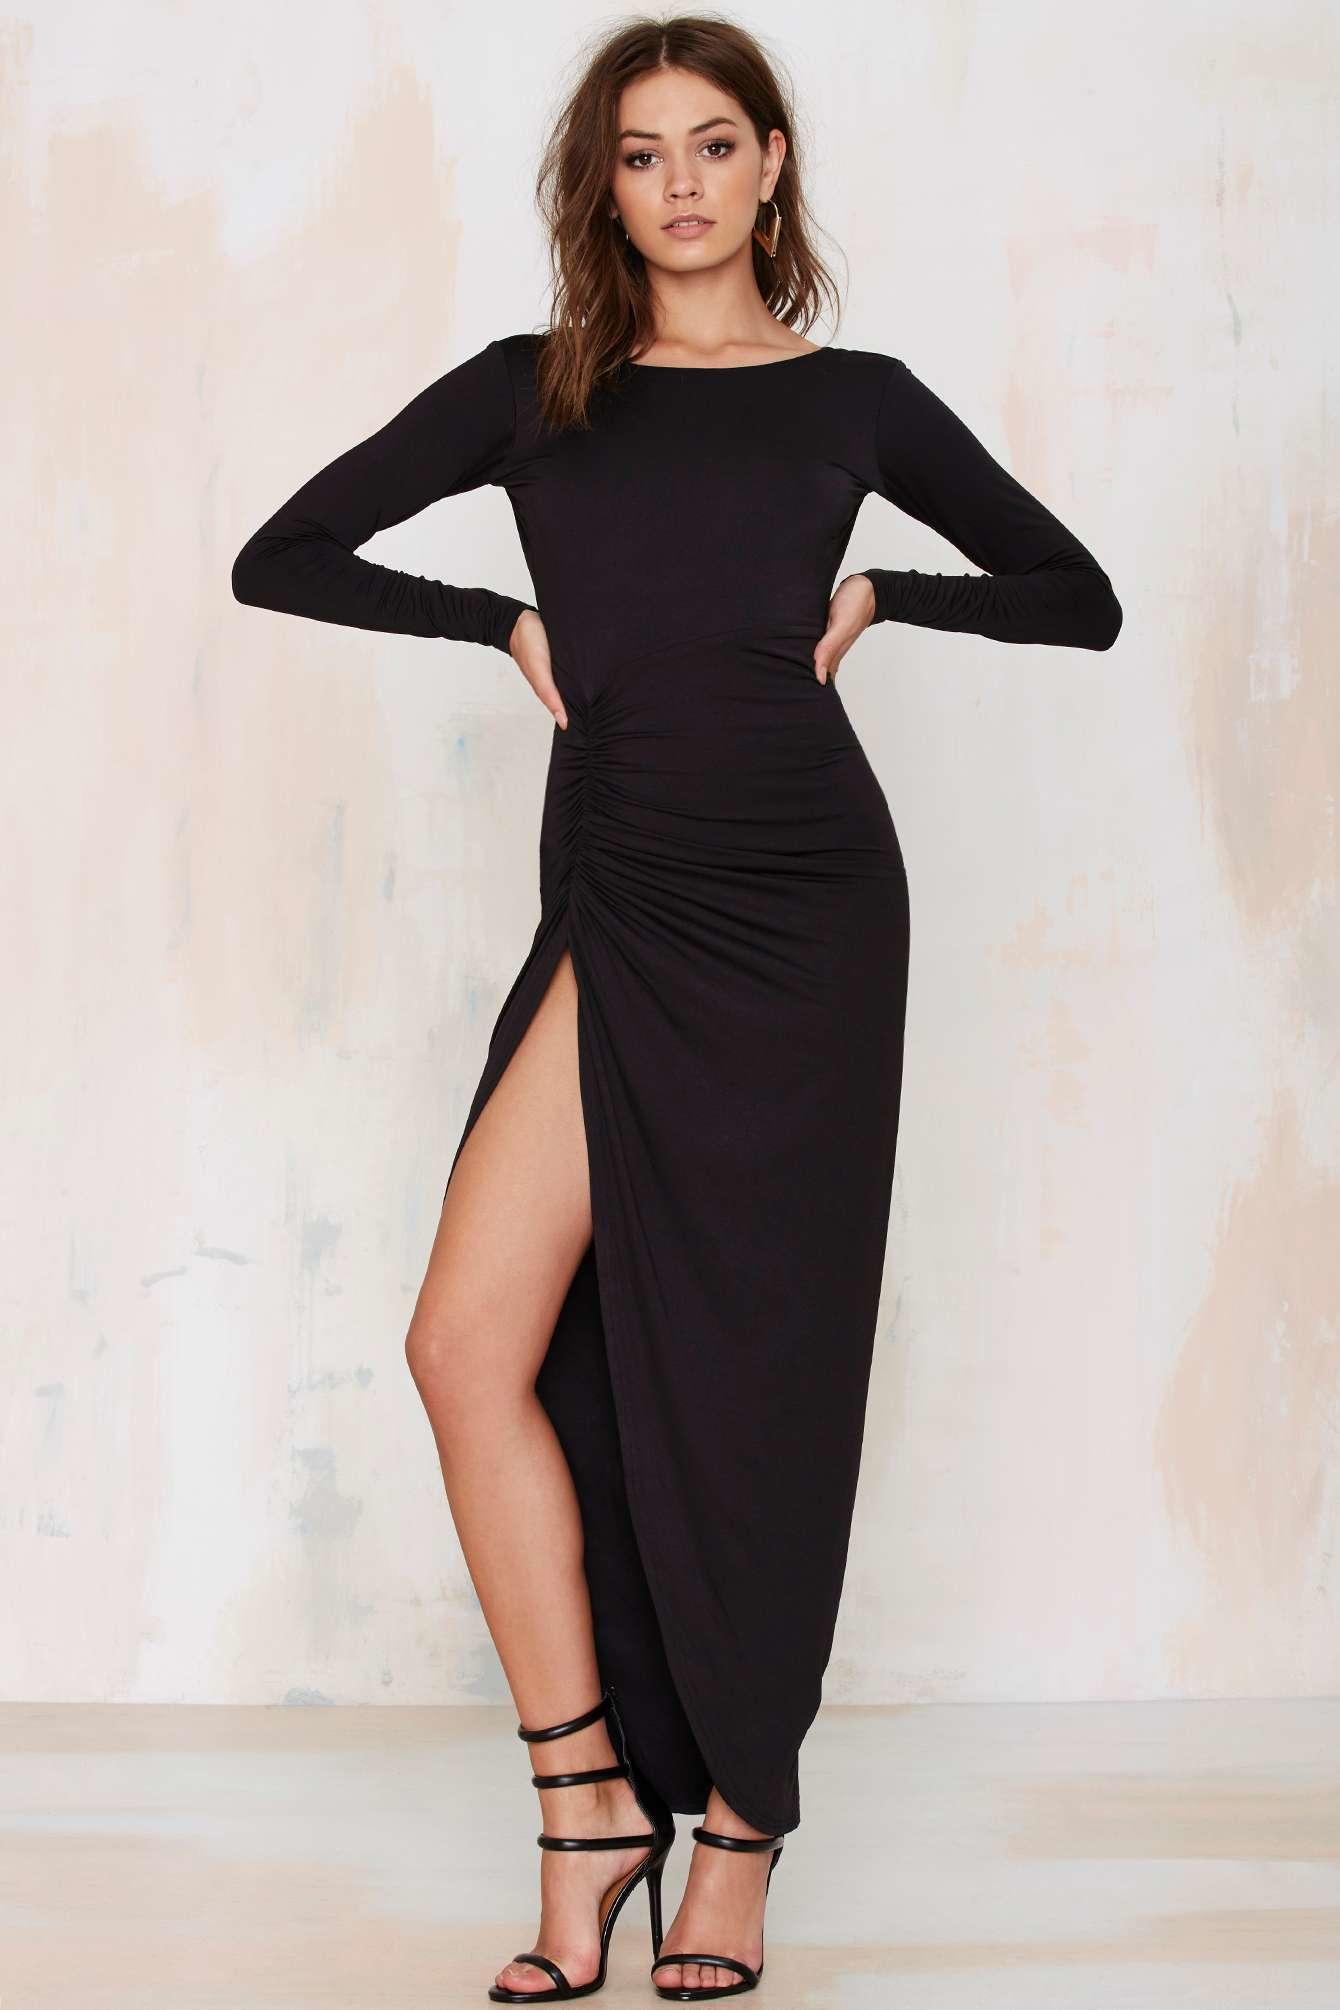 Lyst Lioness Found Love Slit Dress Black In Black